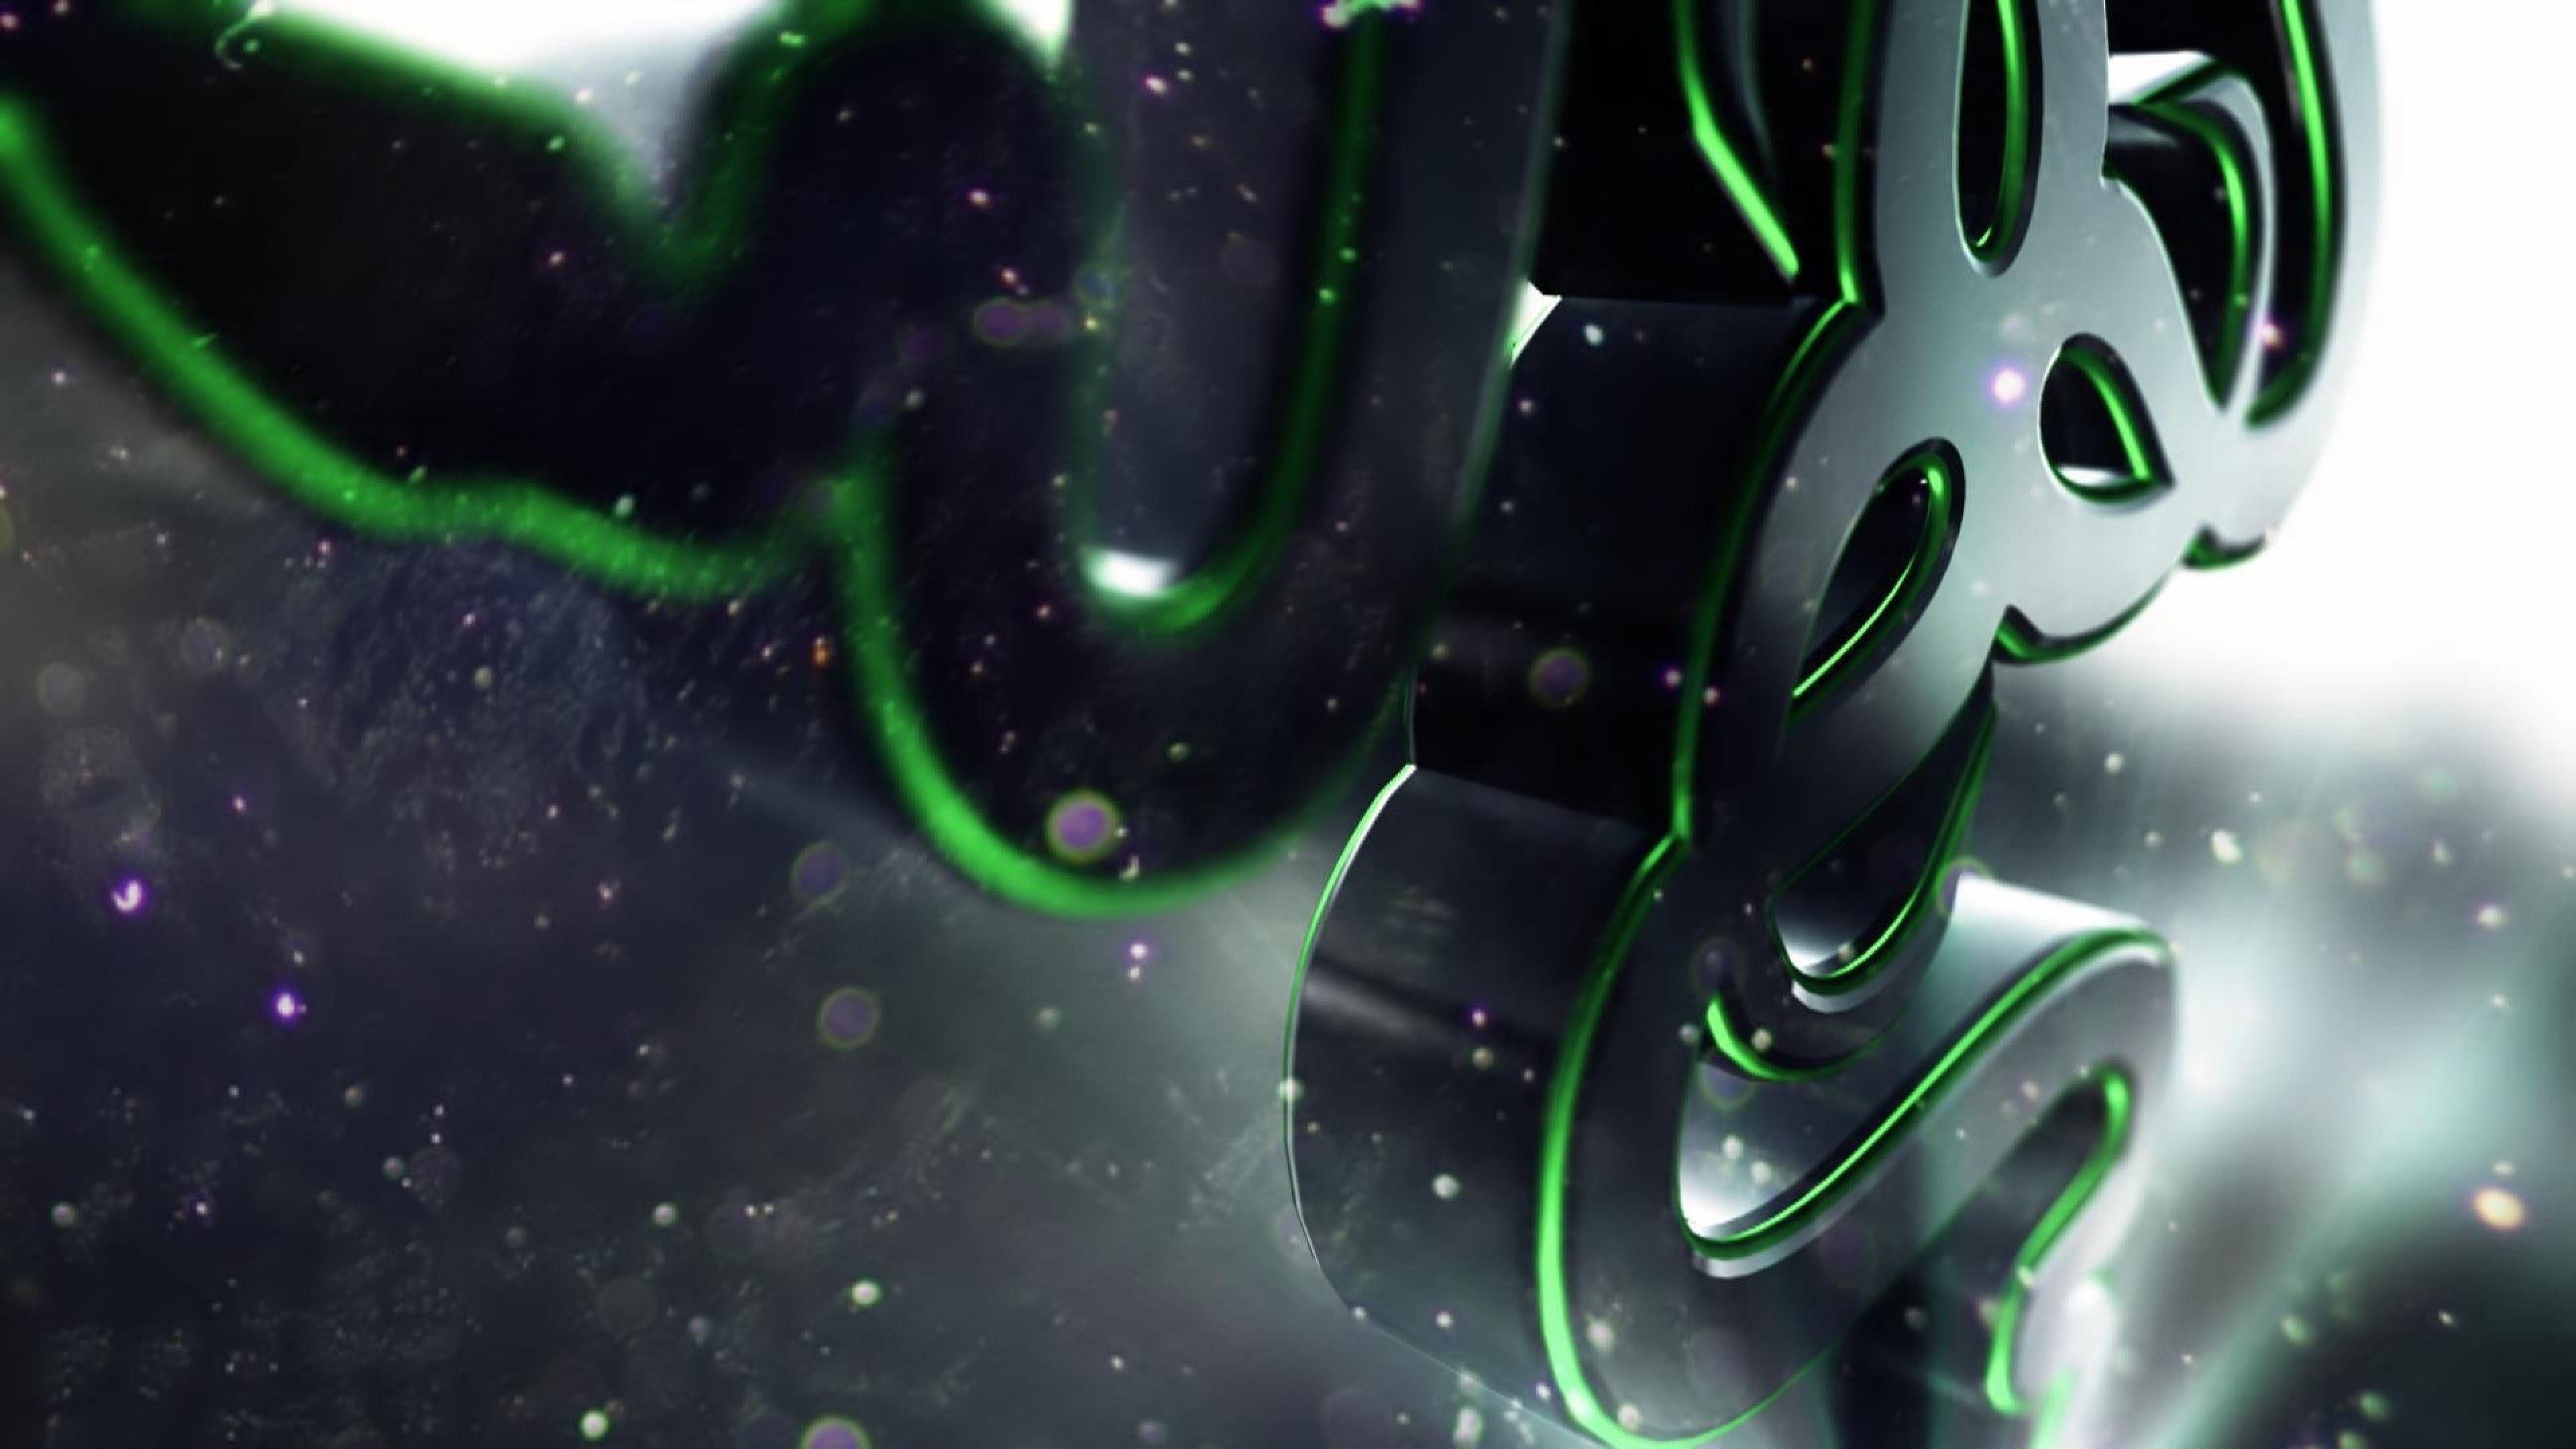 3840x2160 3840x2160 Razer Logo Symbol Shape Wallpaper Background 4k Ultra Hi Tech Wallpaper Gaming Wallpapers Hd Wallpaper